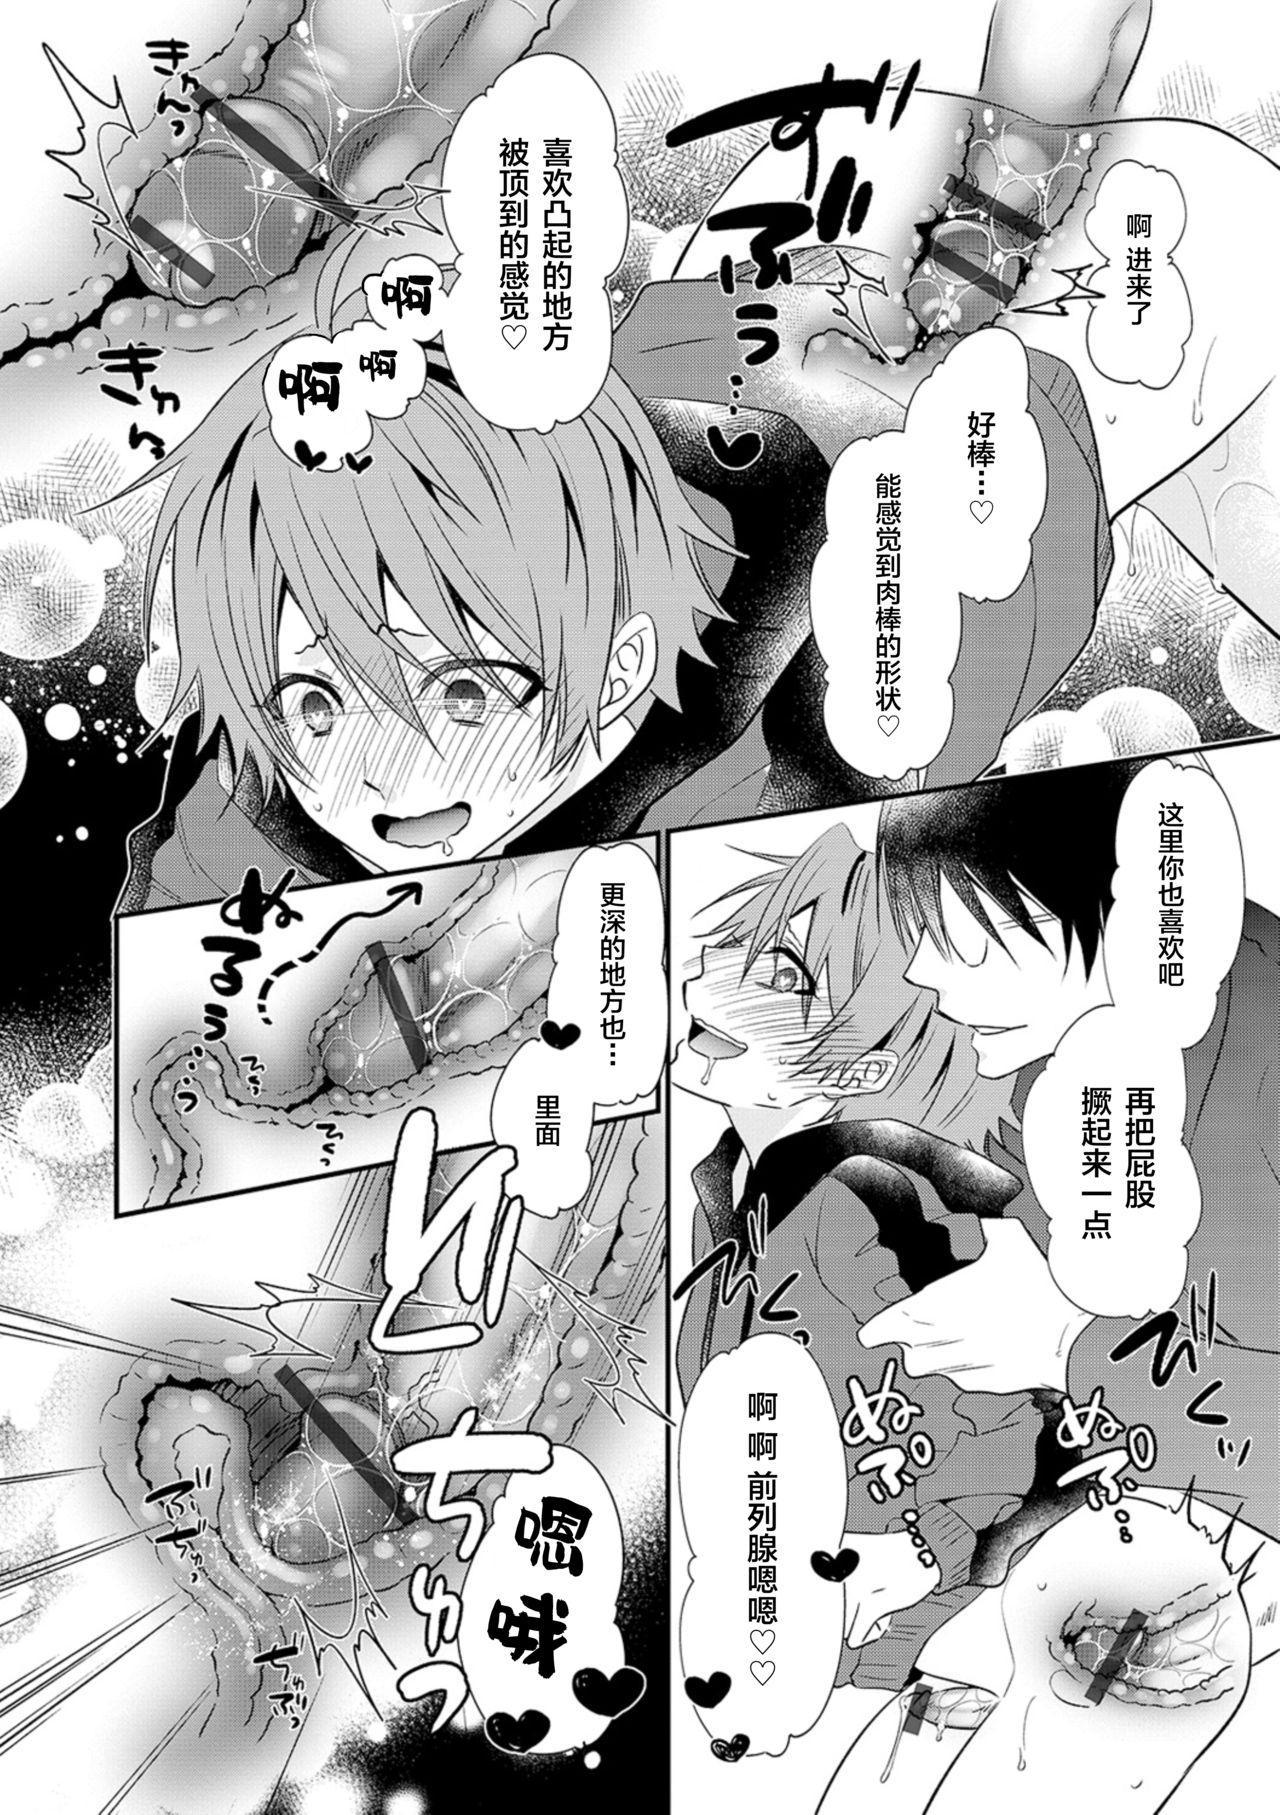 [Naokichi.] Otouto-tachi no Bouken - Indecent brothers adventure Ch. 1-3 [Chinese] [逃亡者×新桥月白日语社] [Digital] 9